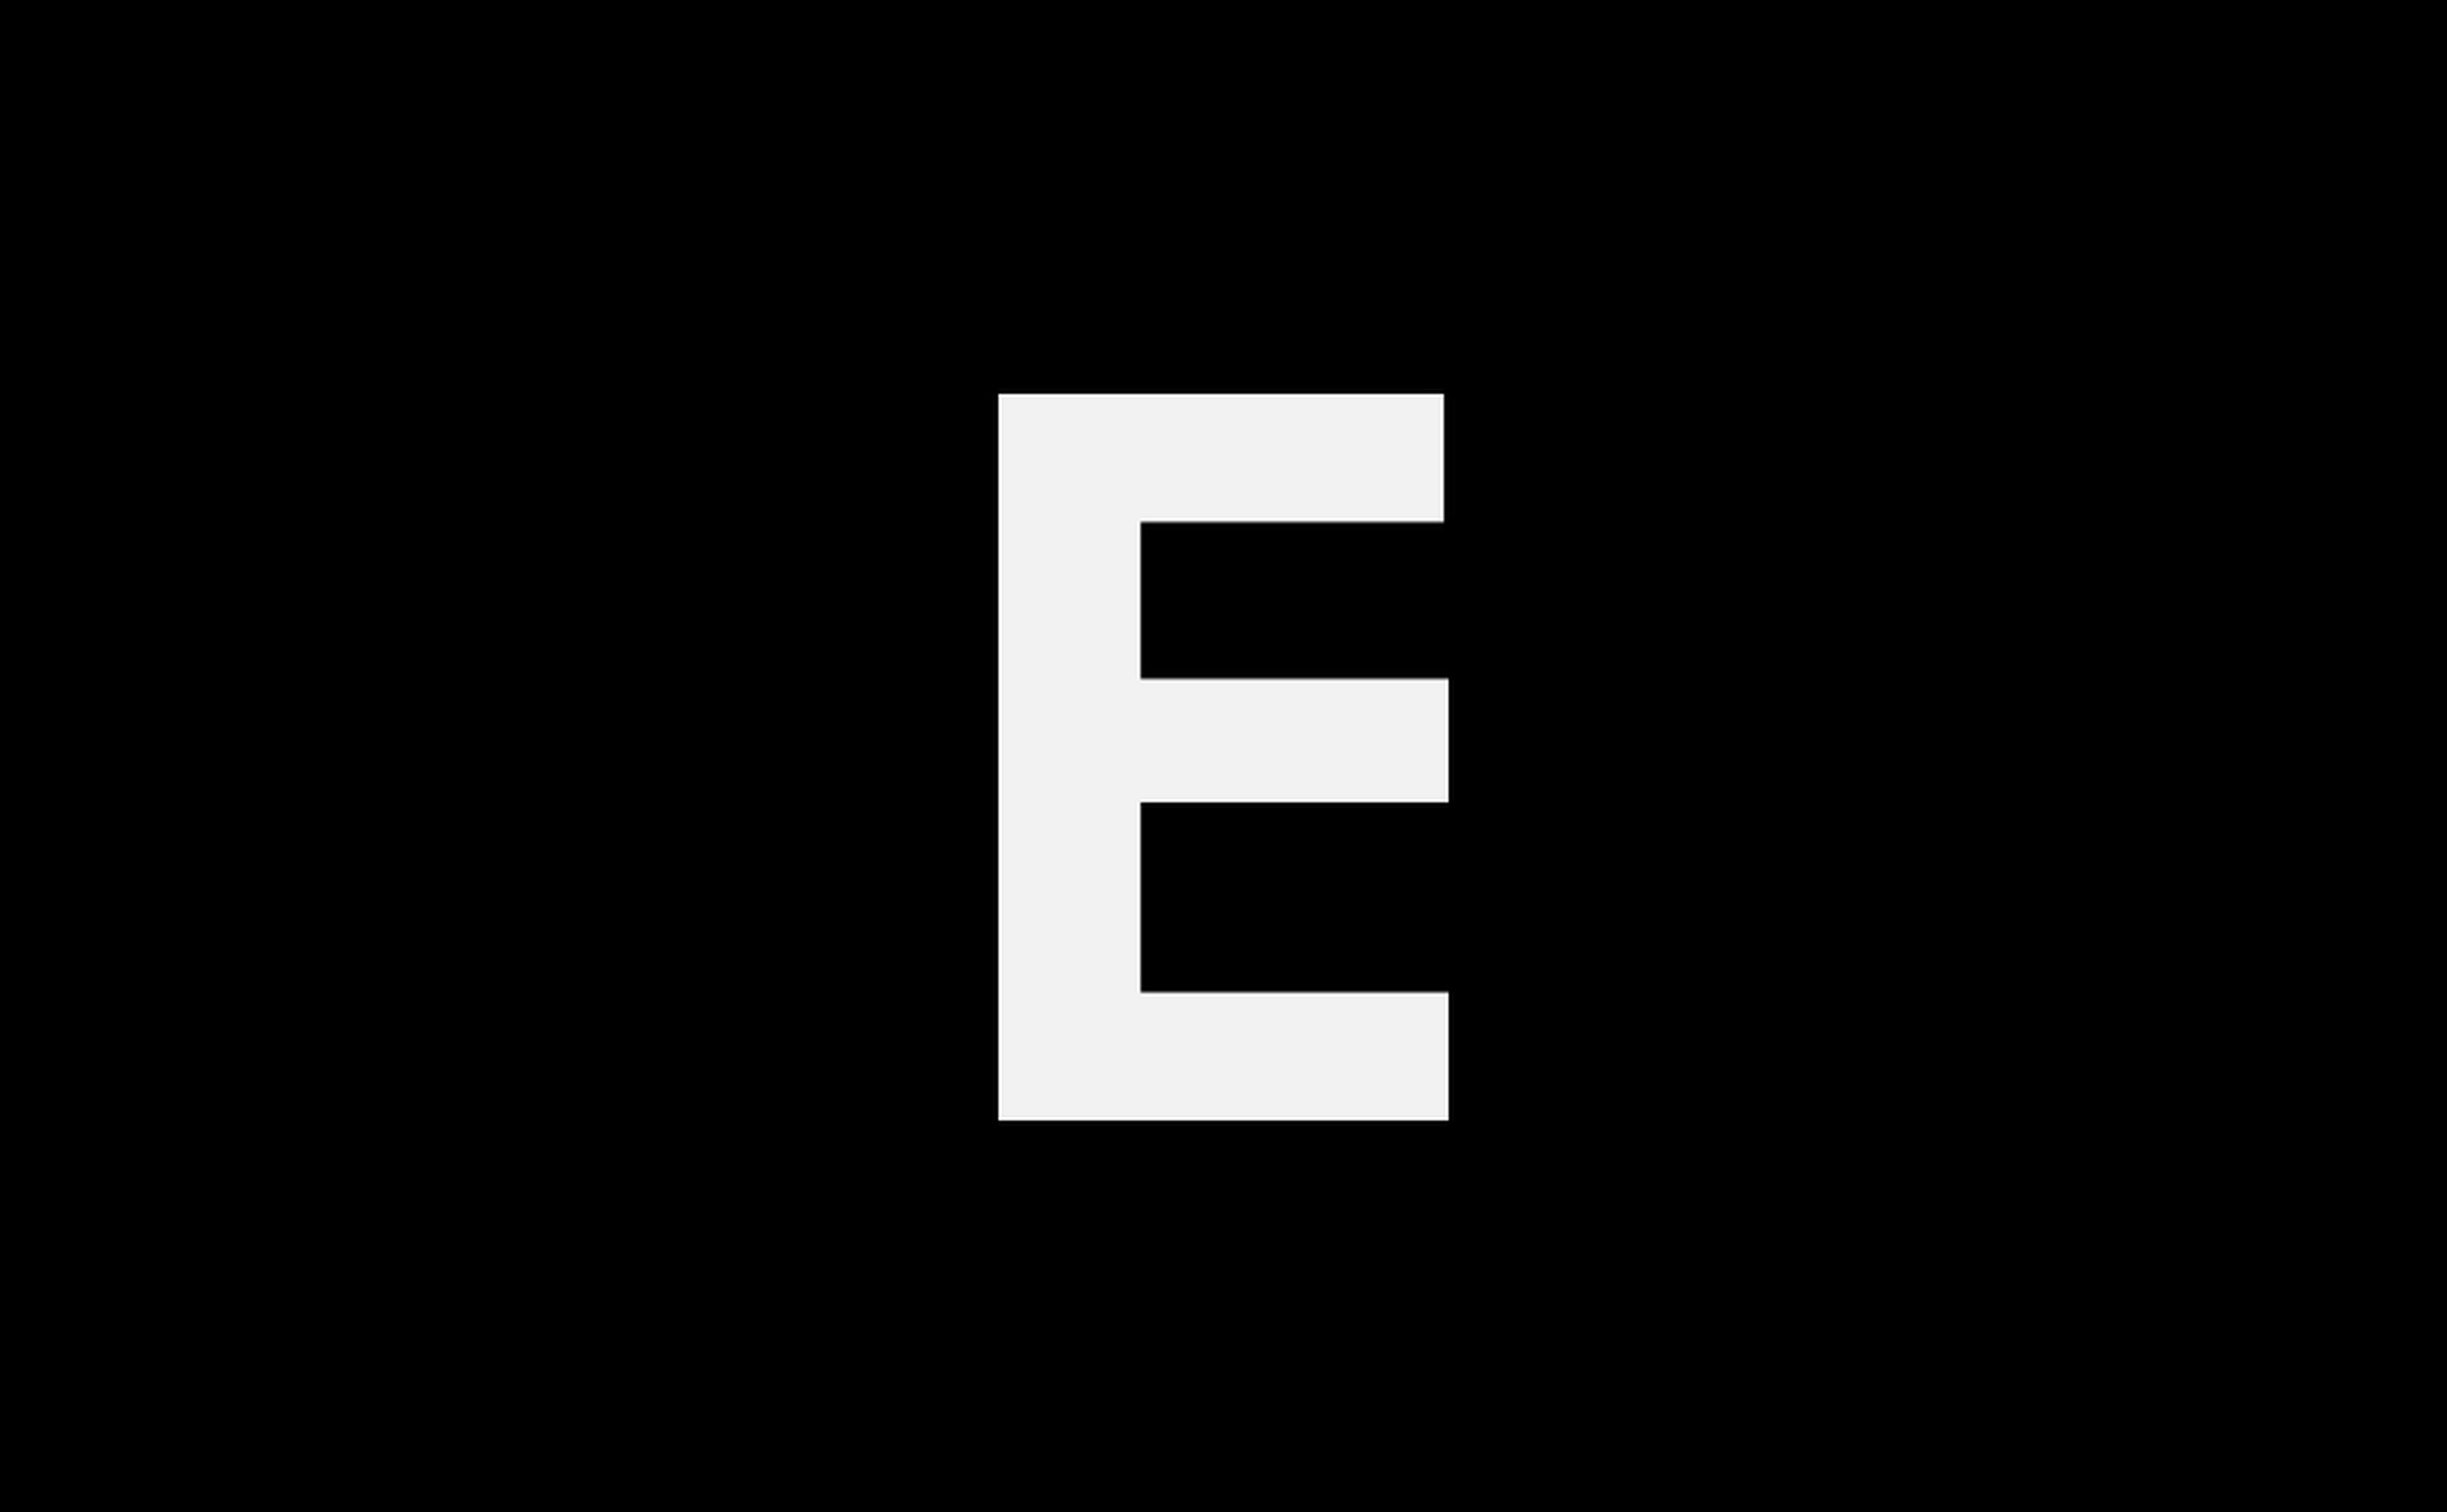 Closed Gate On Grassy Field